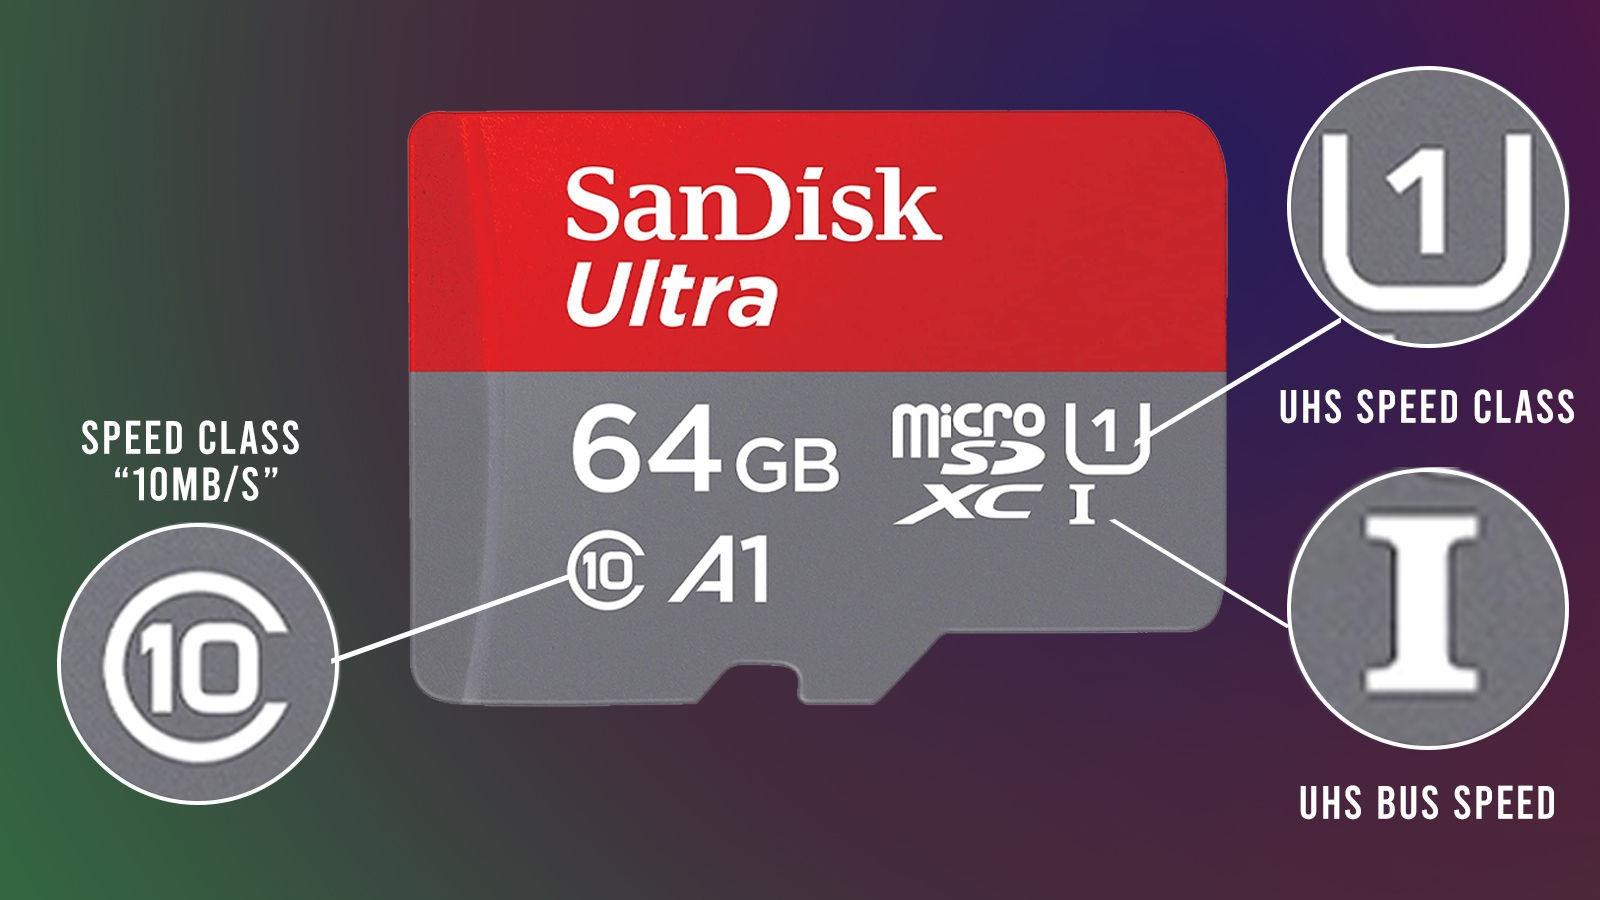 MicroSD symbols